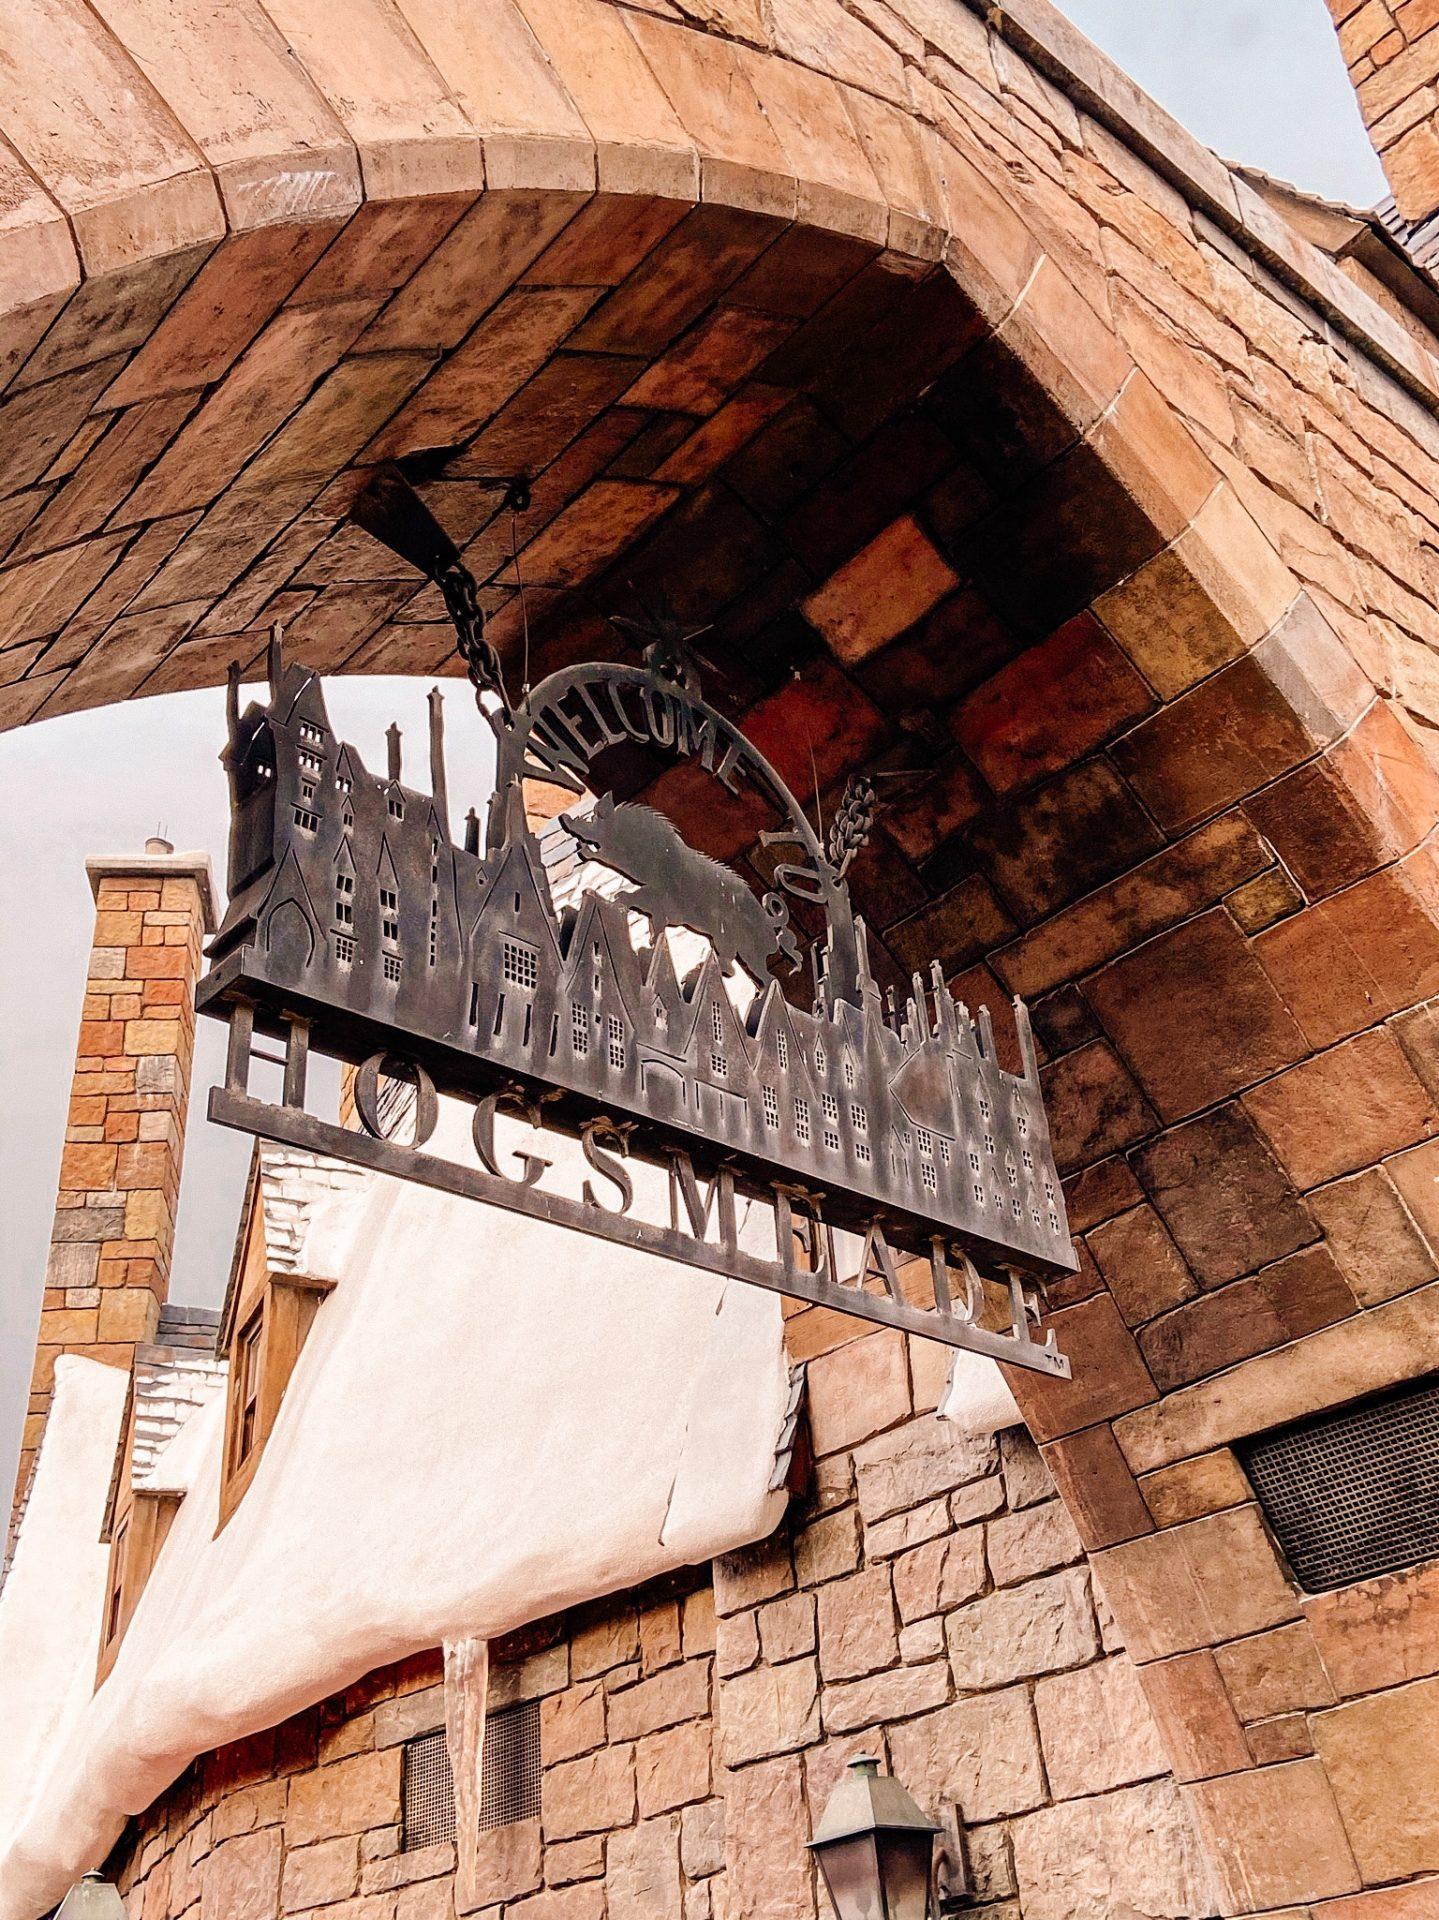 steel hogsemeade sign at hogsmeade in the wizarding world of harry potter universal studios florida